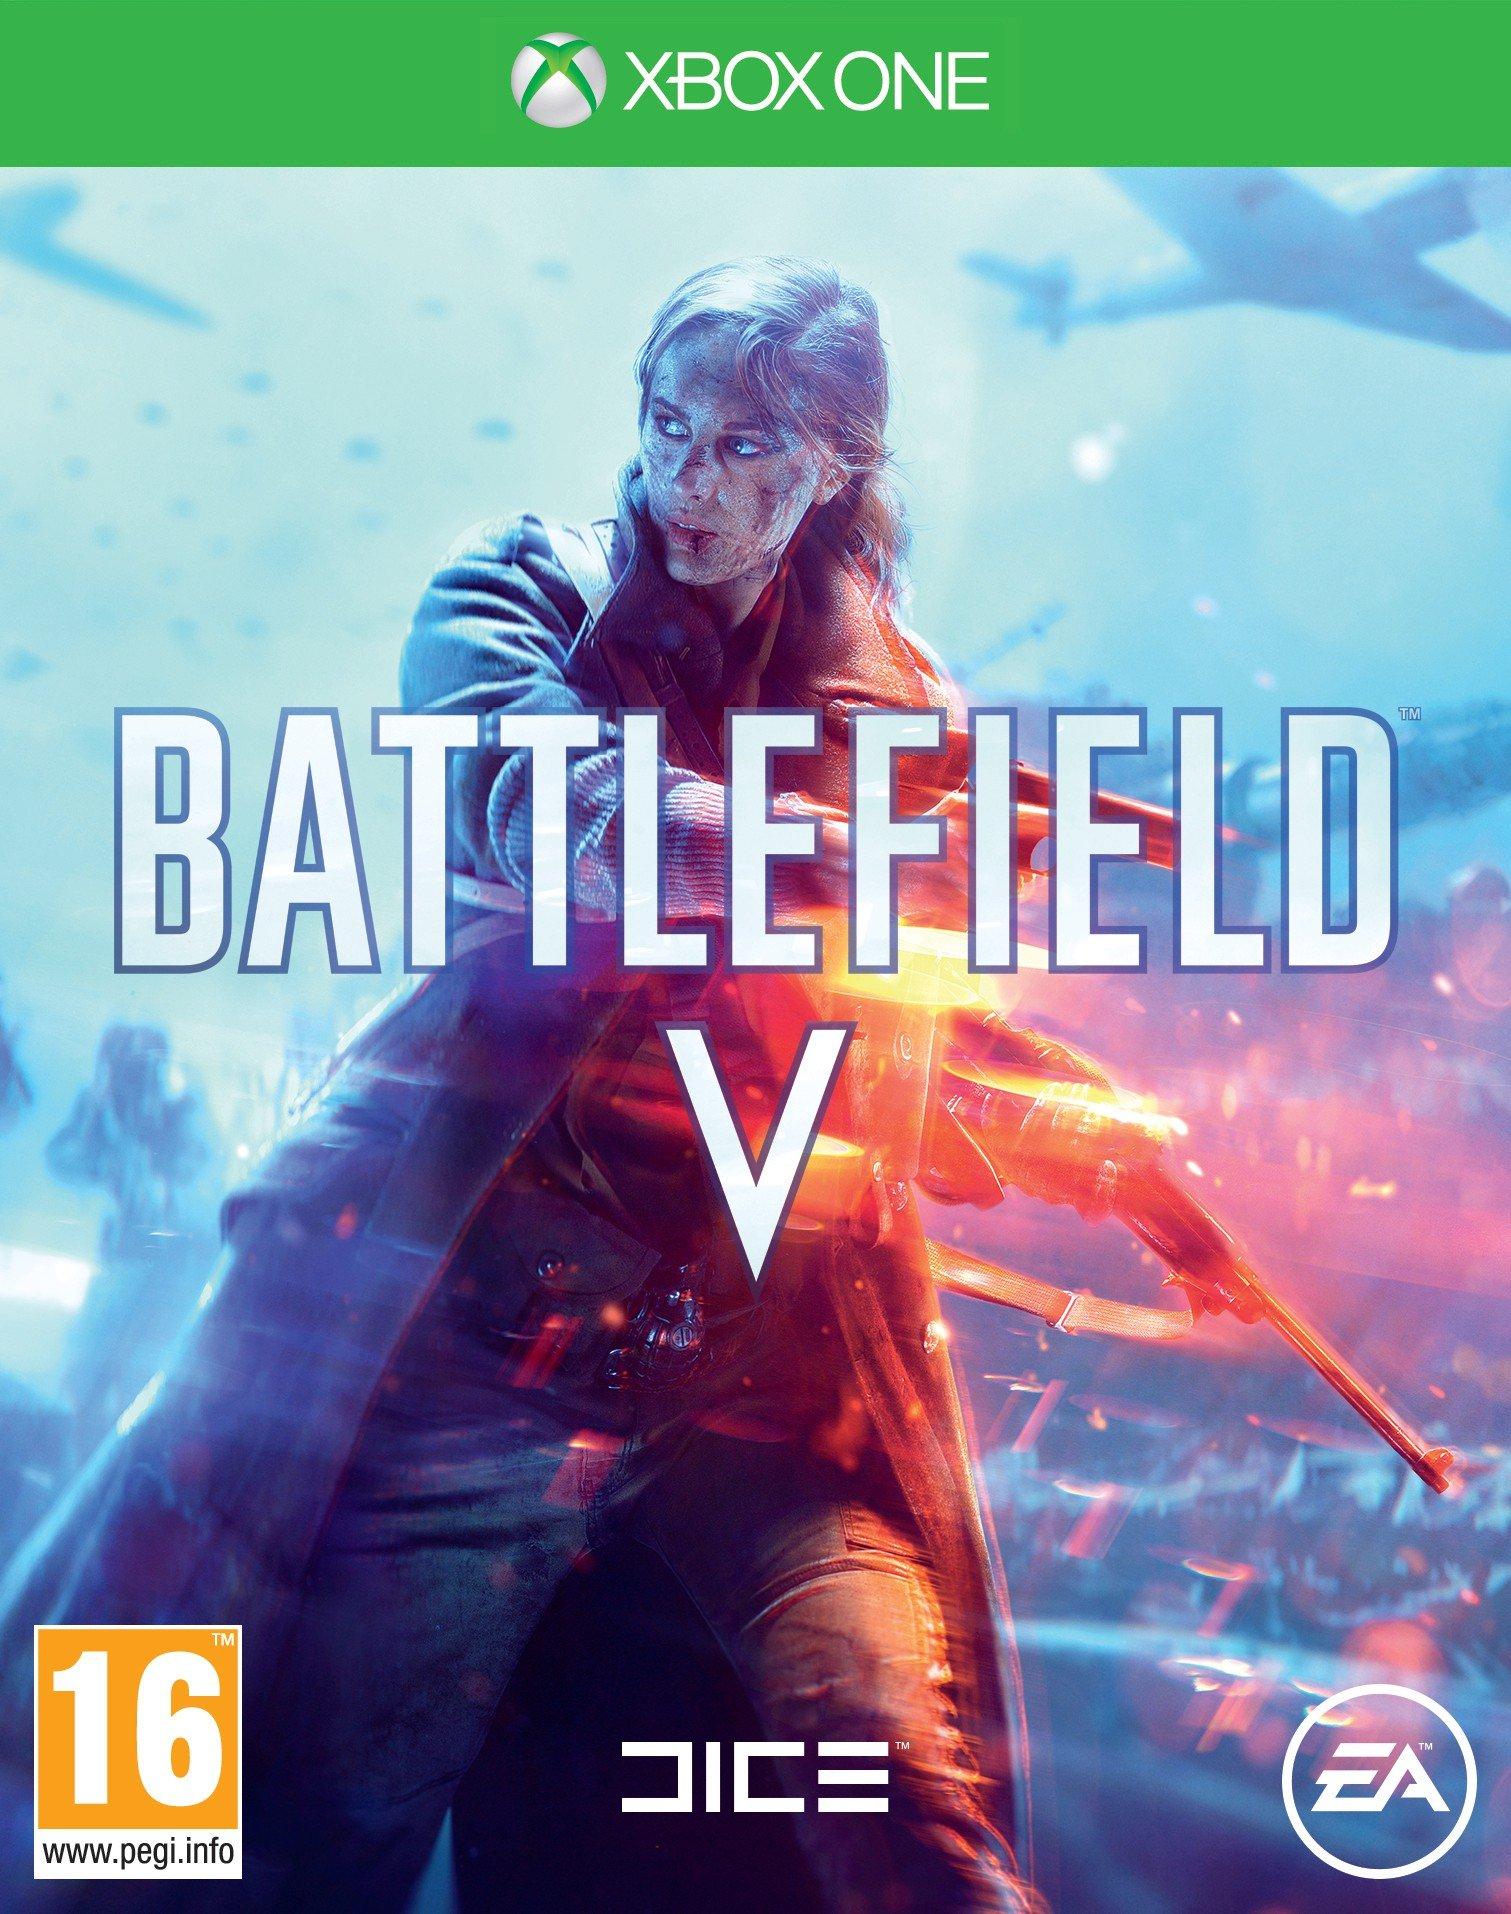 Battlefield V (Xbox One) for £5 @ Asda